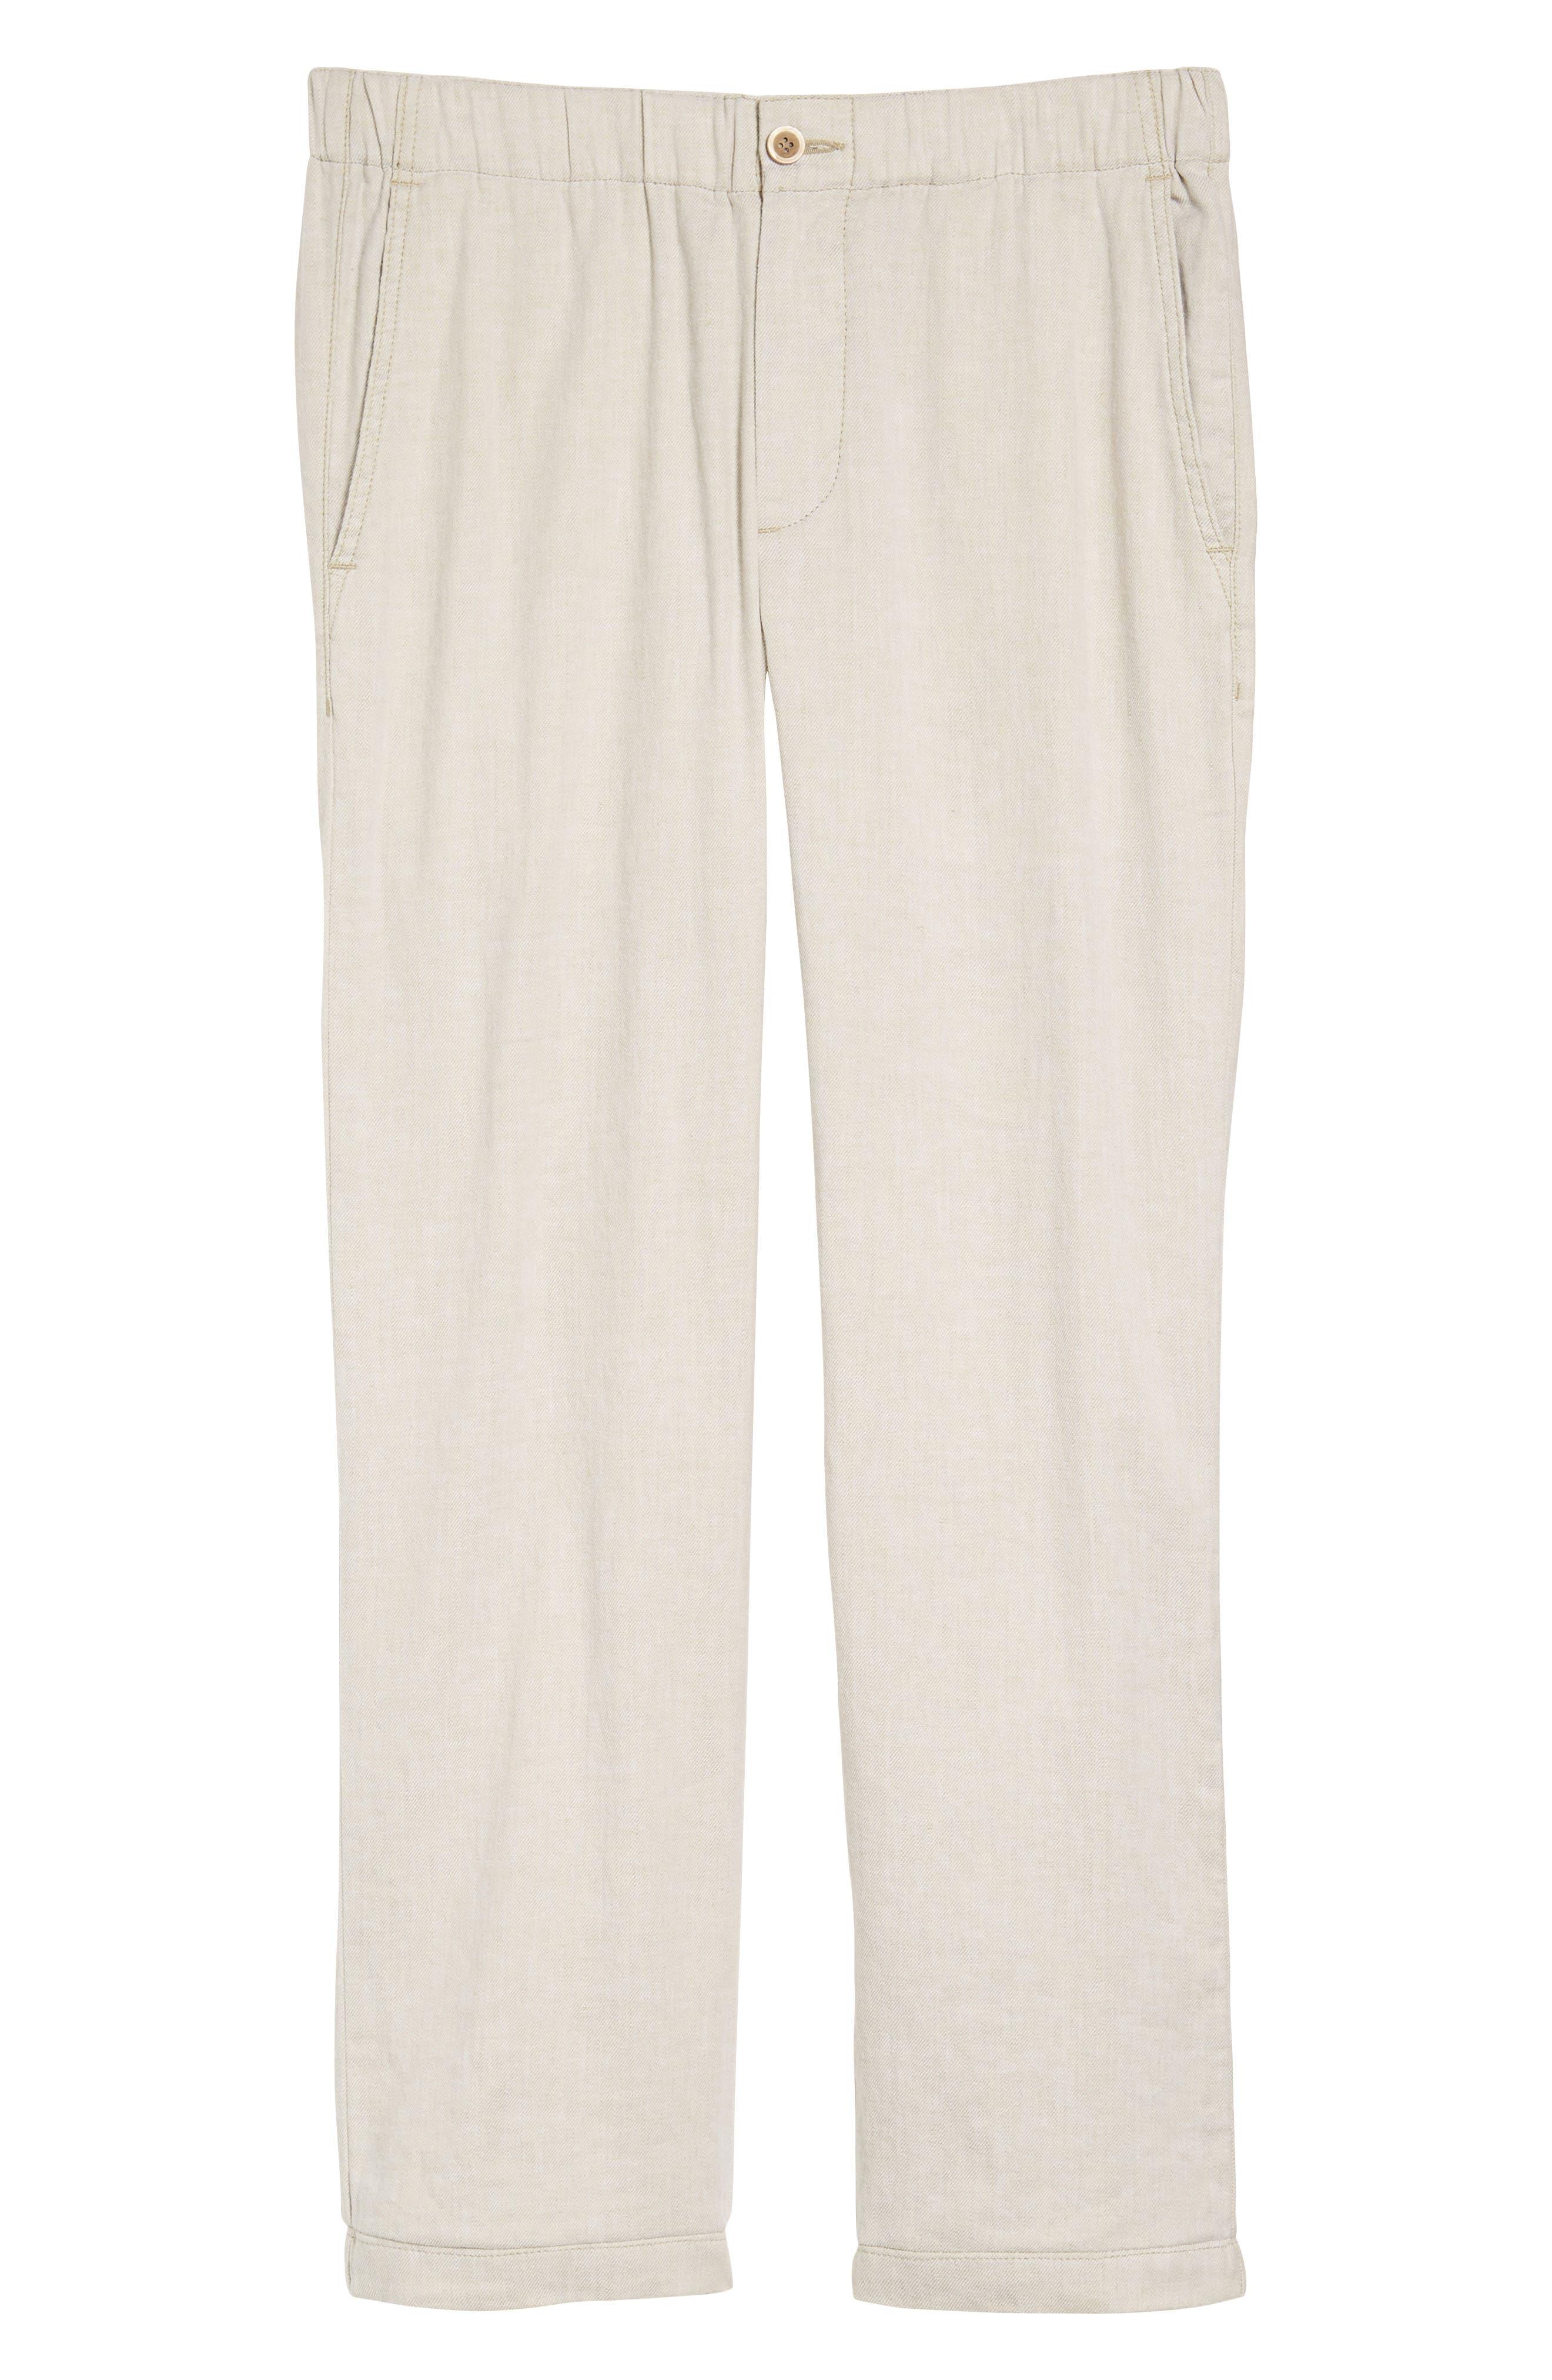 Beach Linen Blend Pants,                             Alternate thumbnail 6, color,                             Stone Khaki